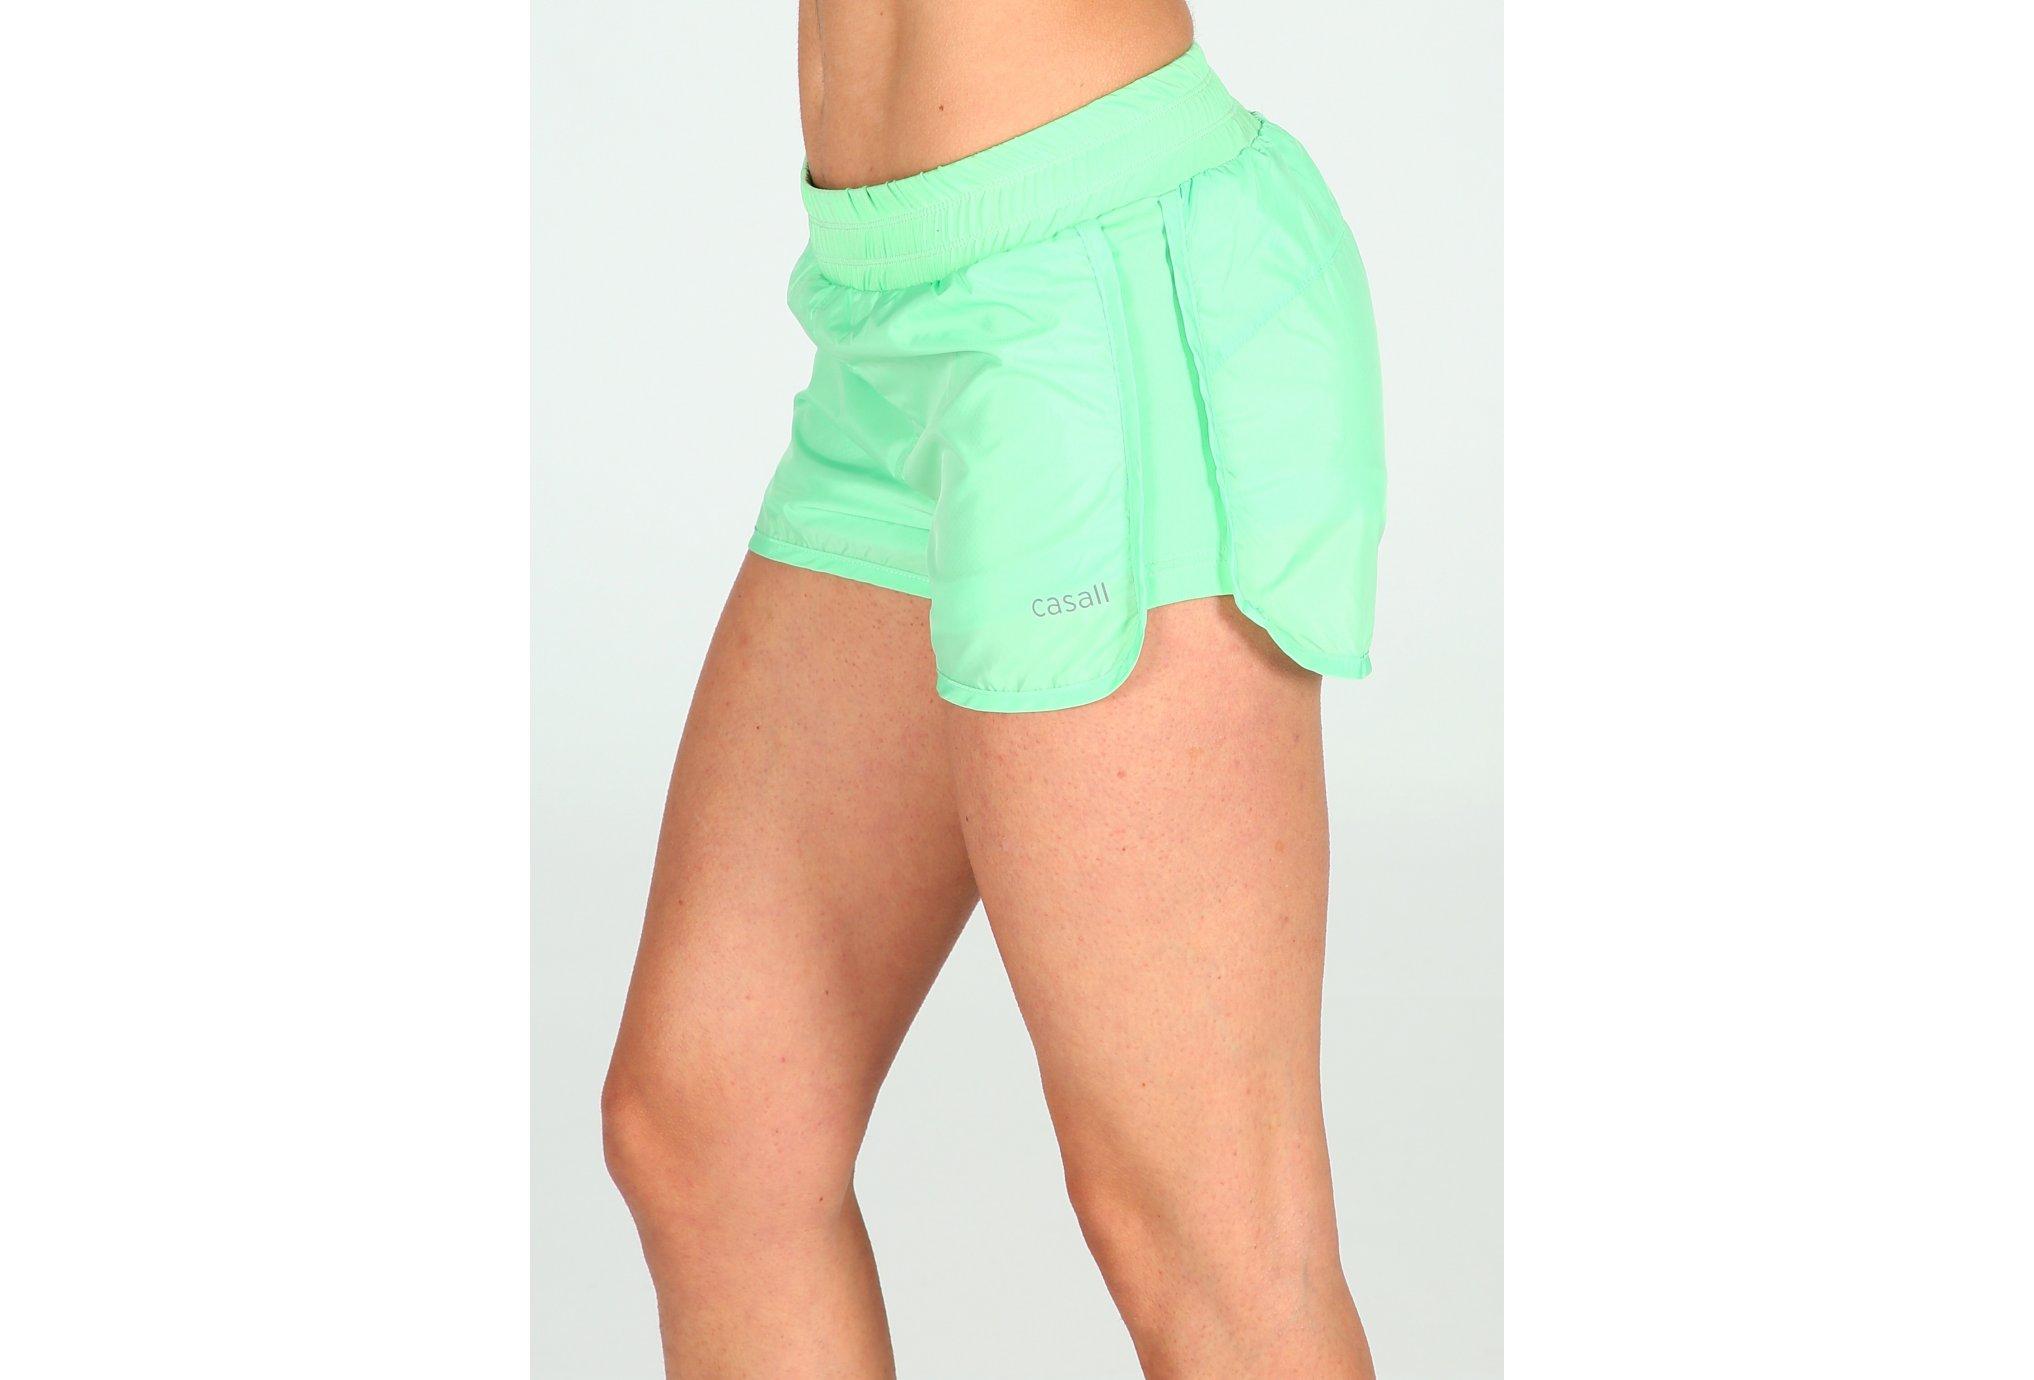 Casall Short Beamline W Diététique Vêtements femme